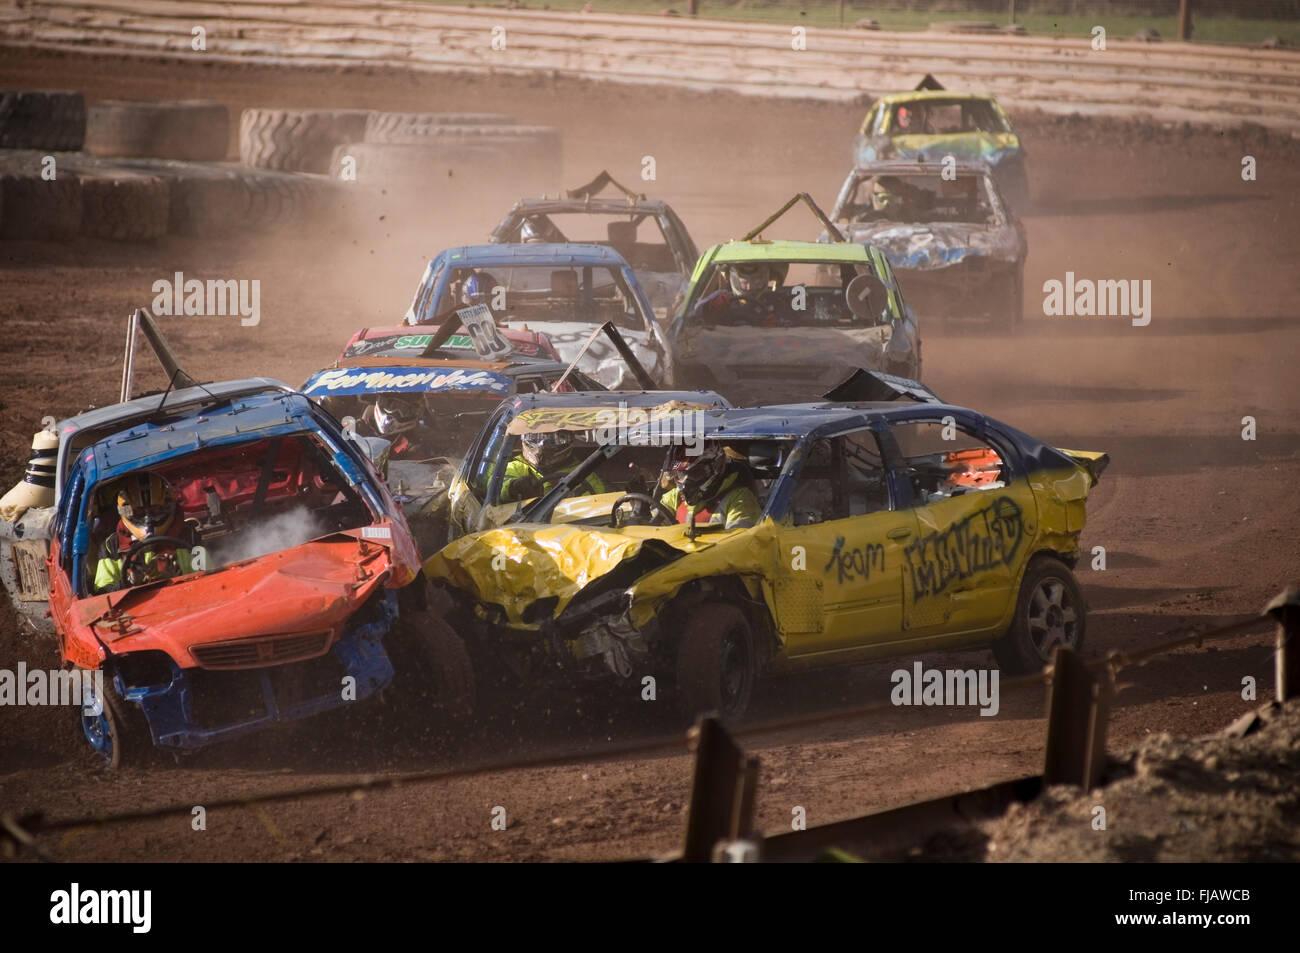 cars colliding collision car collisions crash crashes crashing stock race races racing track tracks shale banger - Stock Image